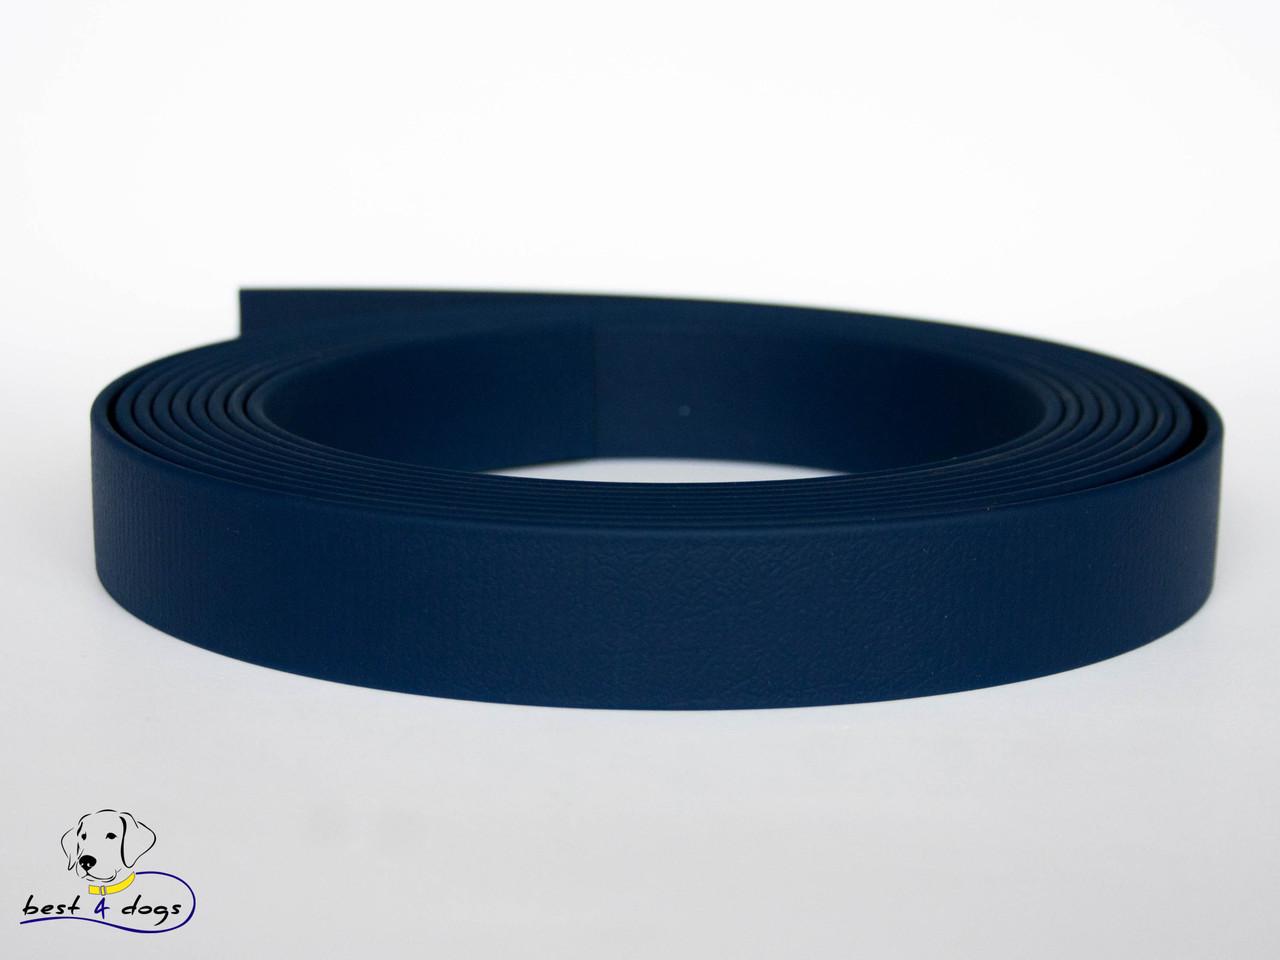 Ошейник-удавка из биотана, Синий Тёмный, 19мм